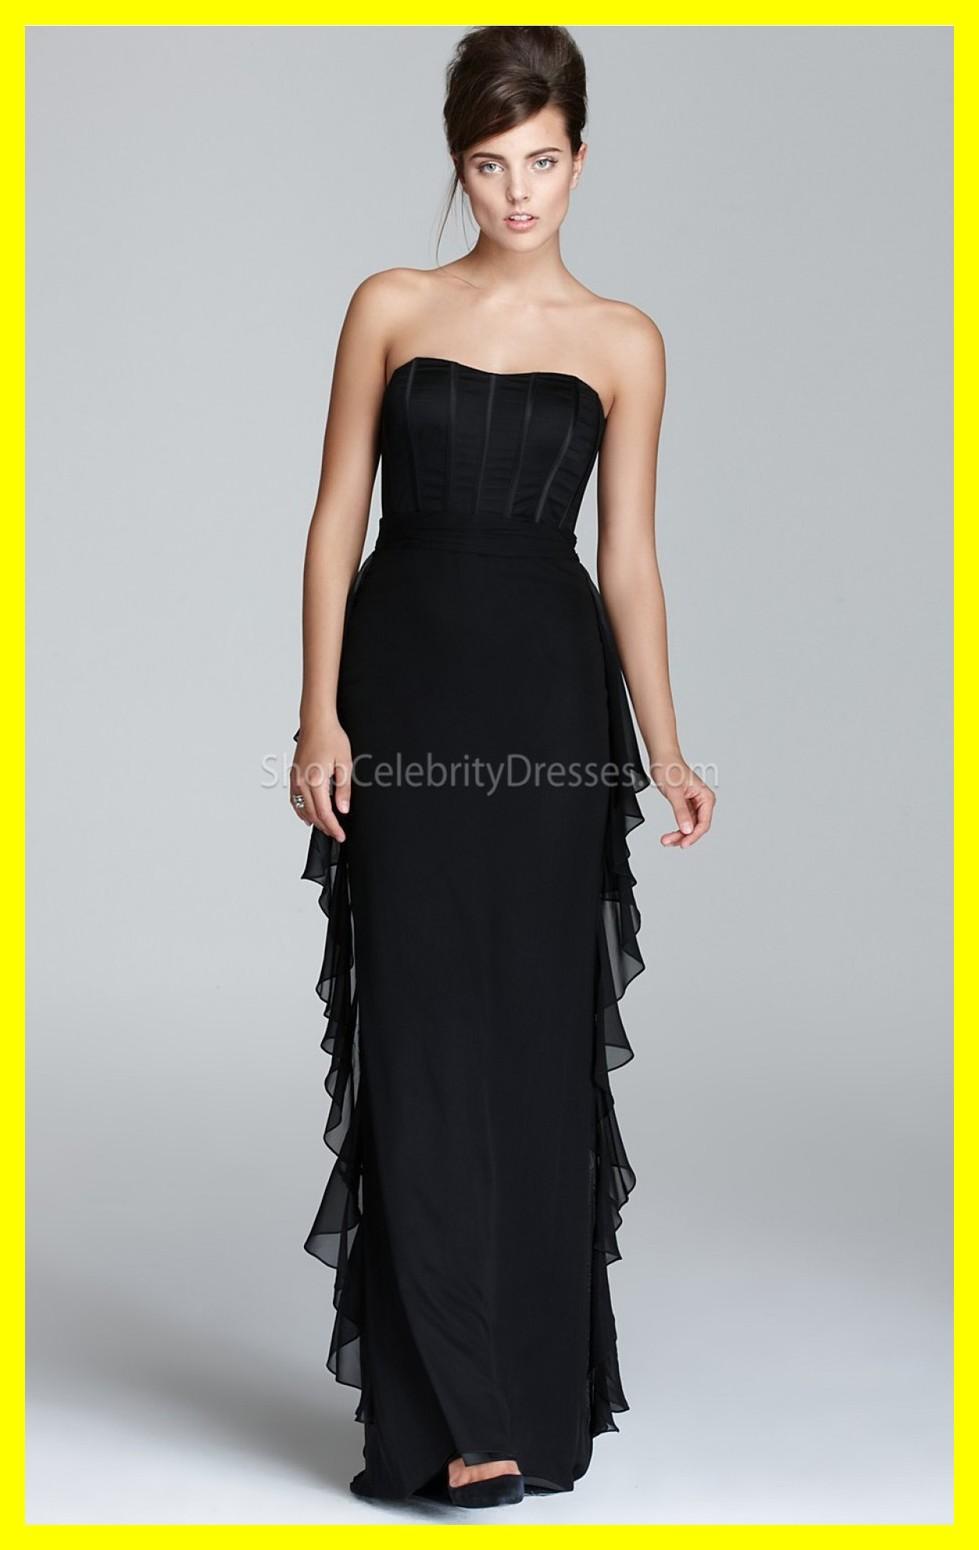 Prom dresses corset dress styles middle school vintage for Corset bras for wedding dresses